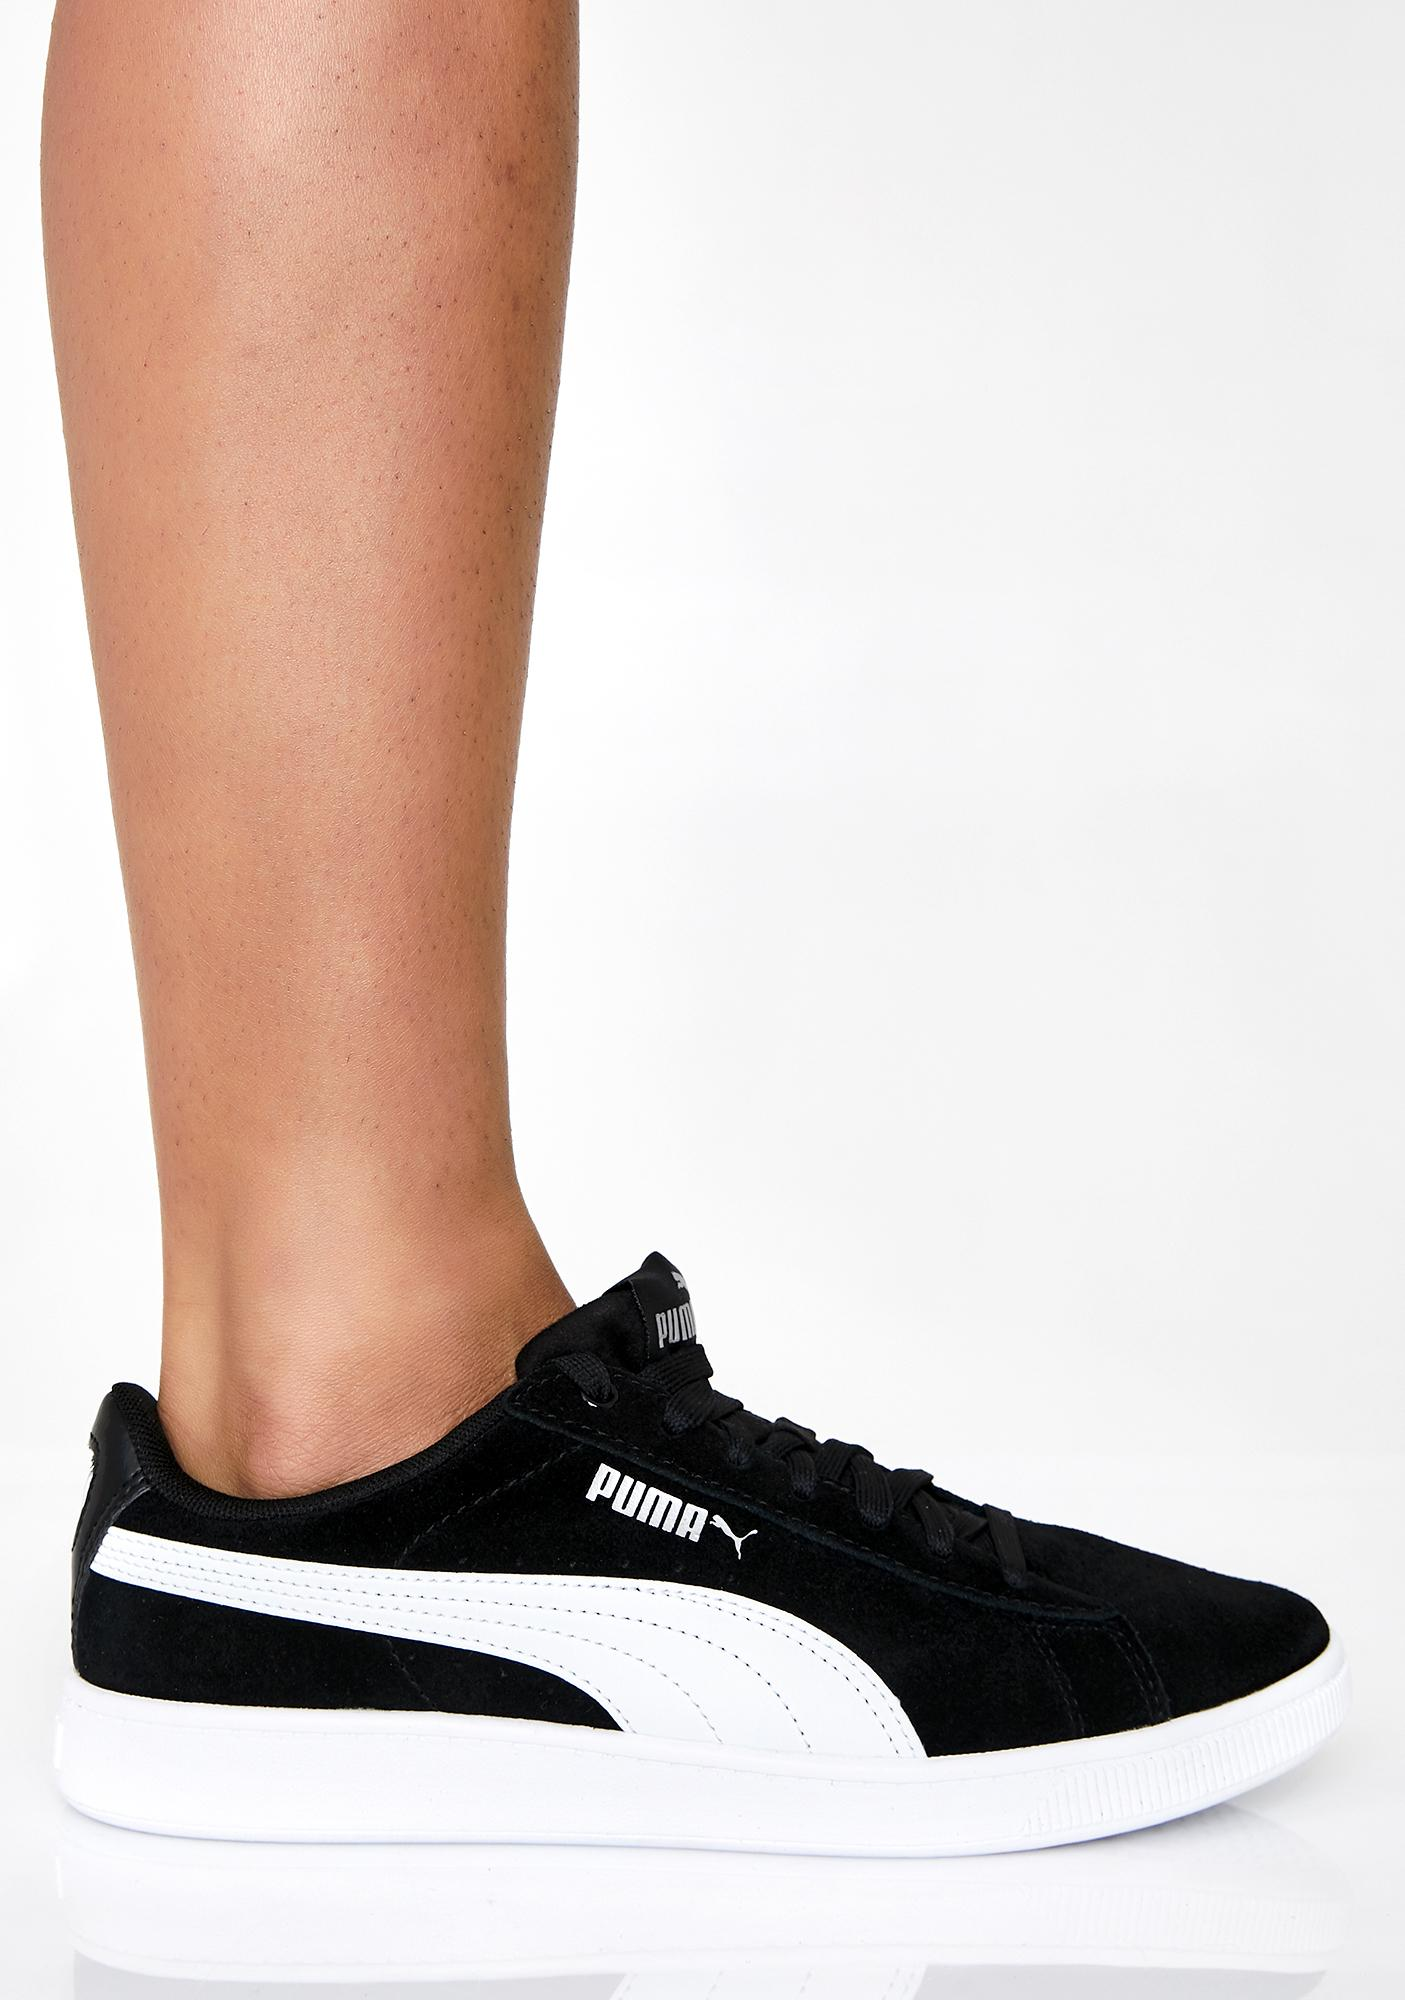 PUMA Dark Vikky V2 Classic Sneakers